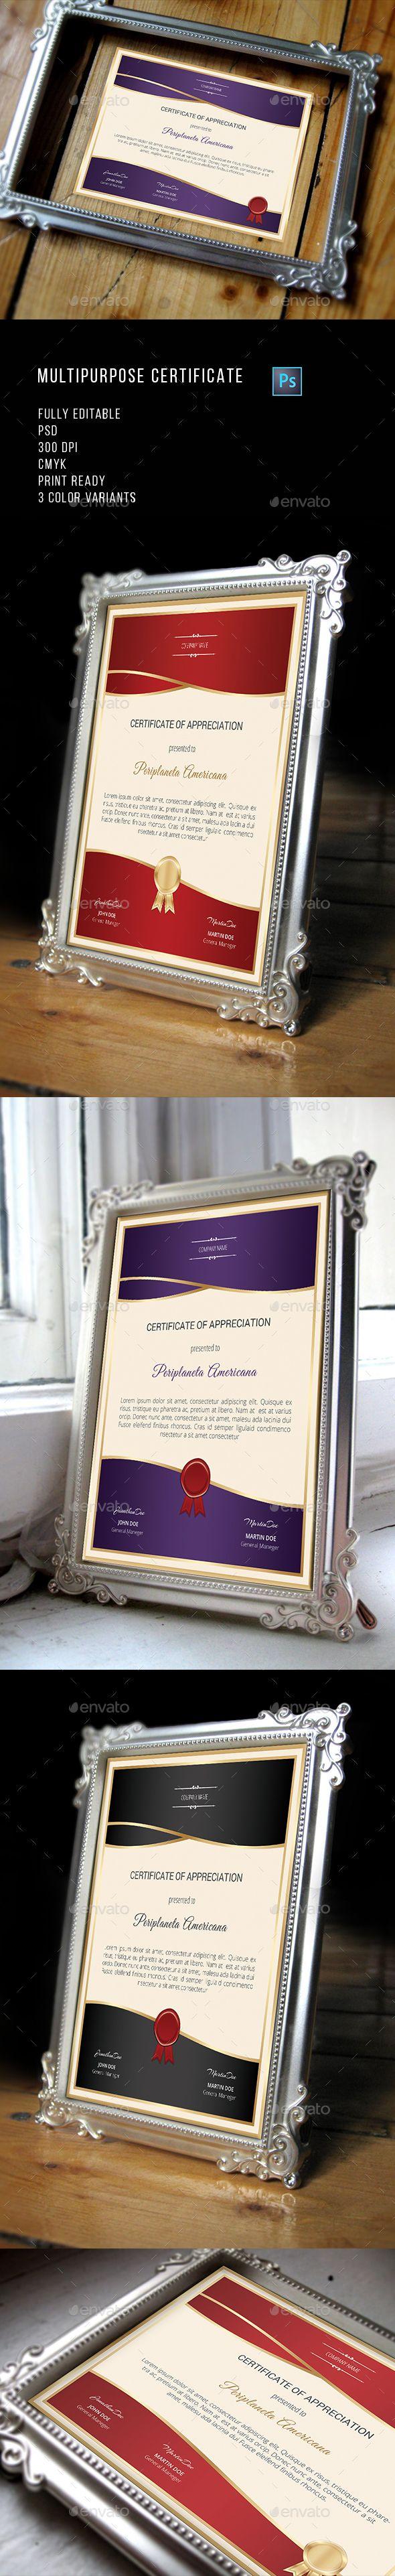 90 best certificate images on pinterest preschool award